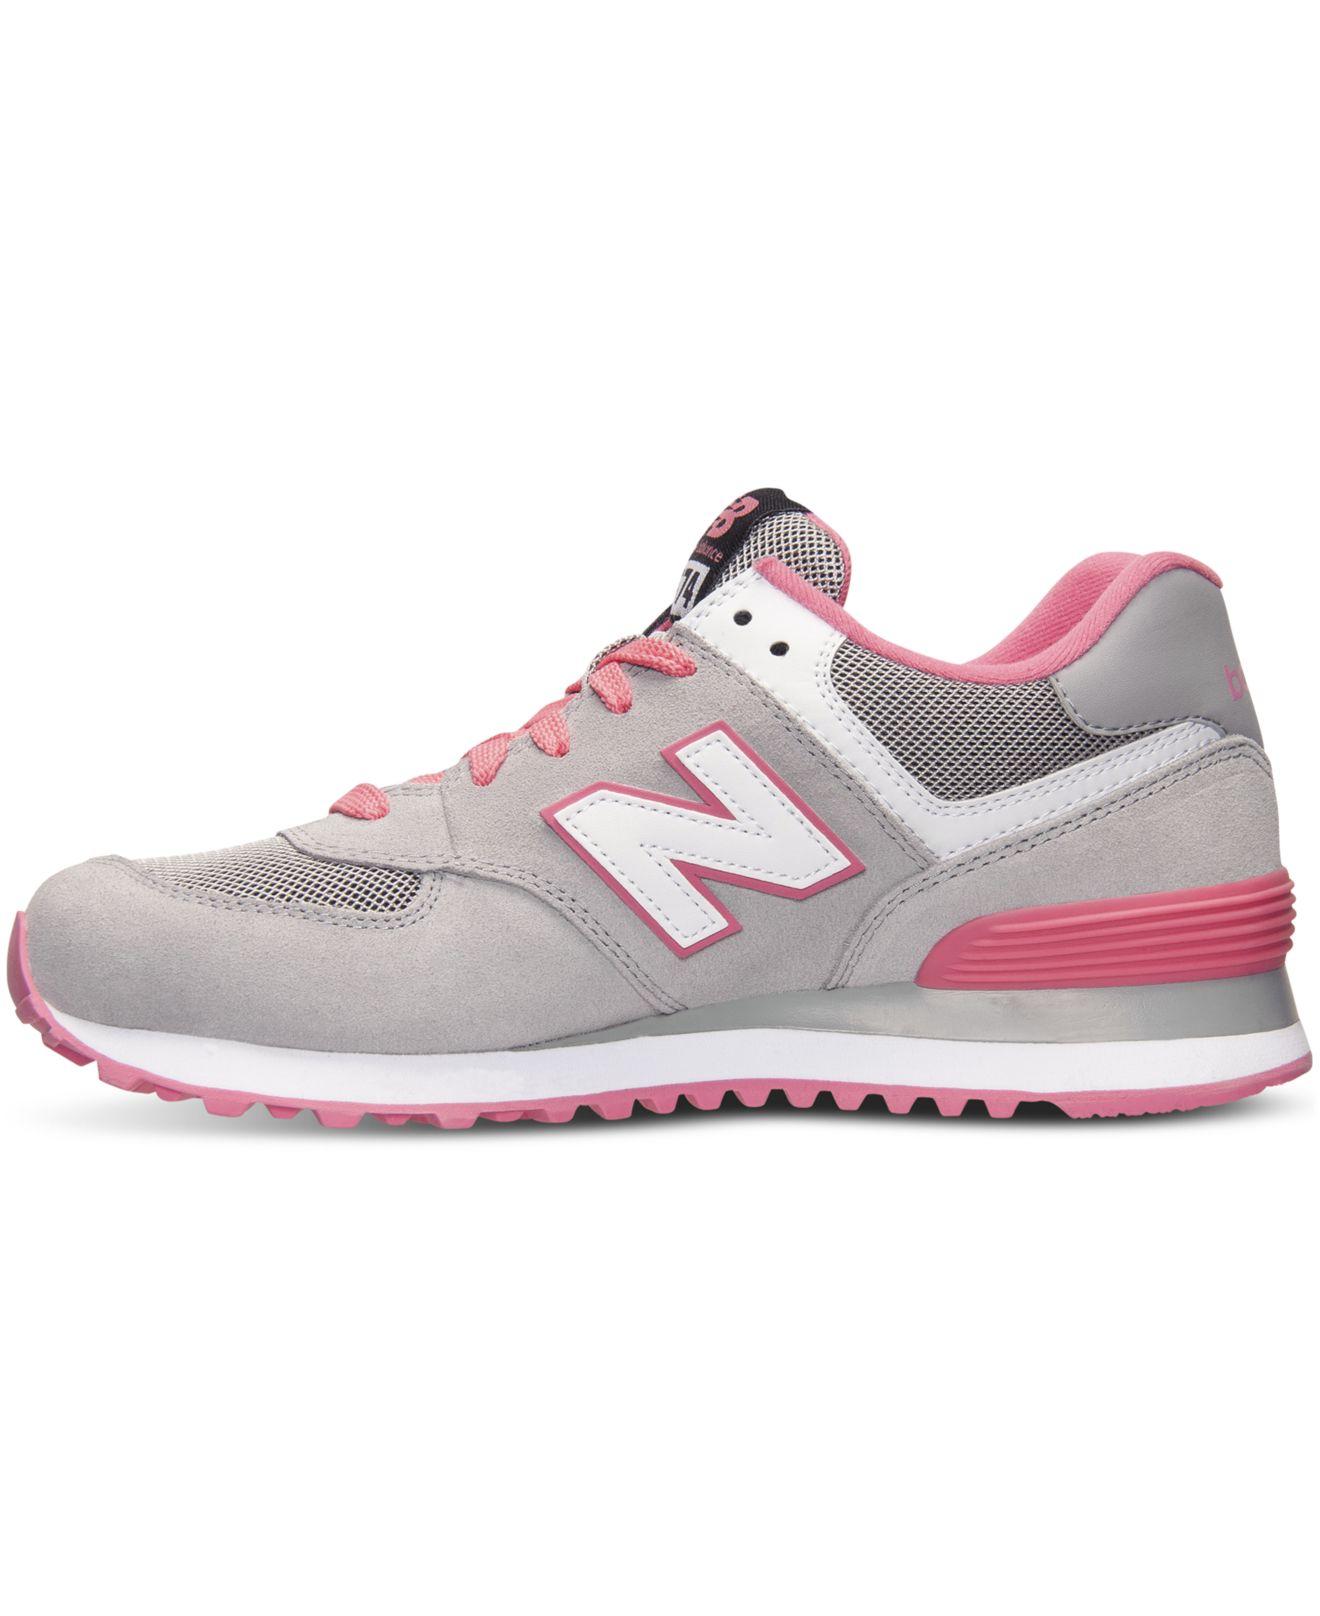 new balance 574 women's grey pink